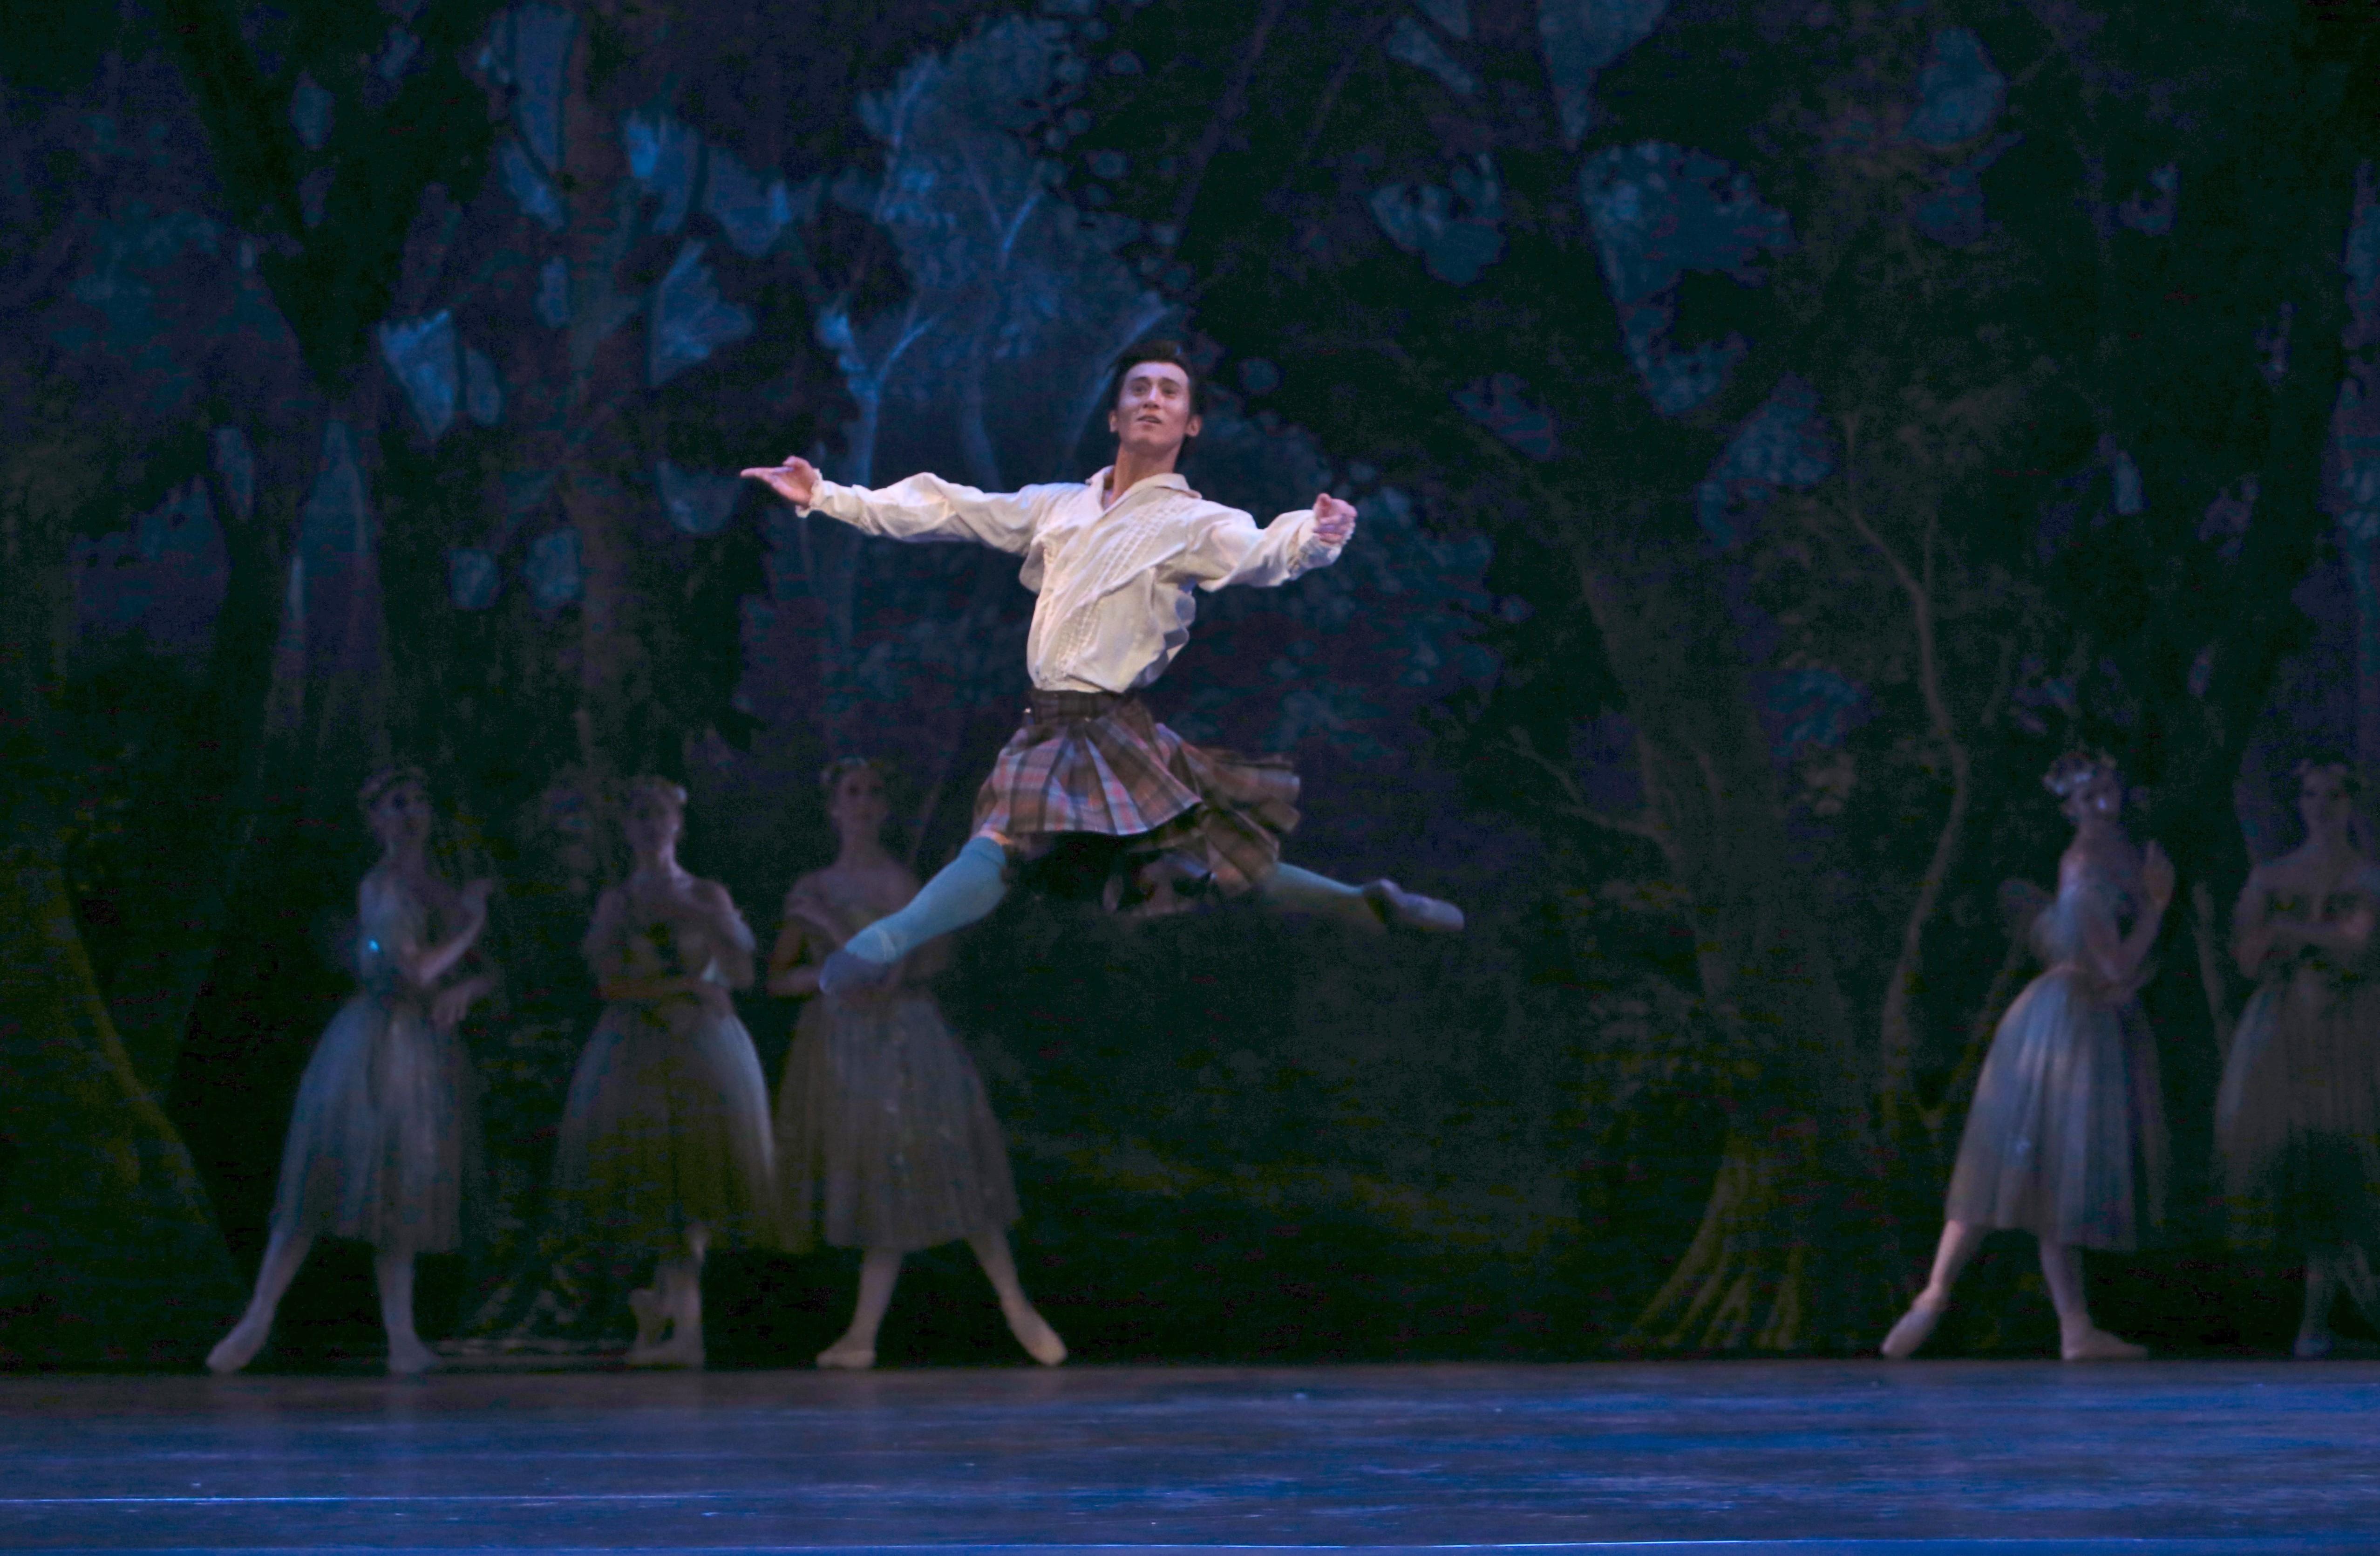 Queensland Ballet. La Sylphide. Guest Artist Qi Huan. Photo by David Kelly.